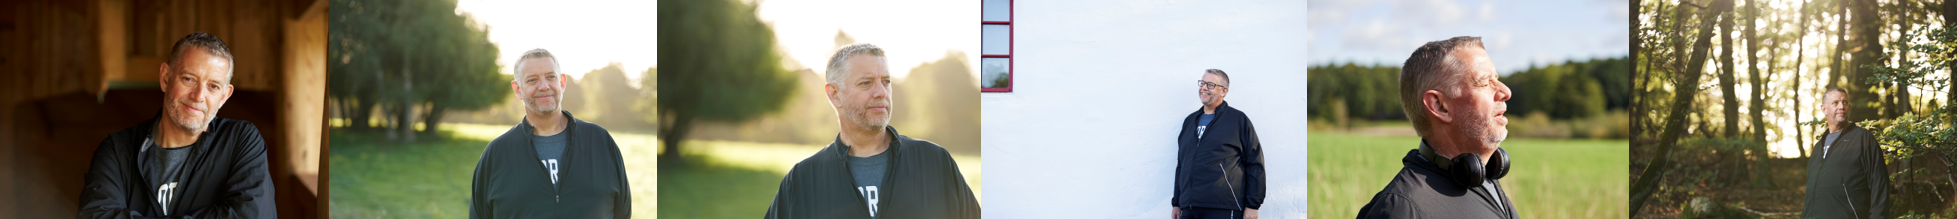 Bjarne Lynderup - vægttab og velvære